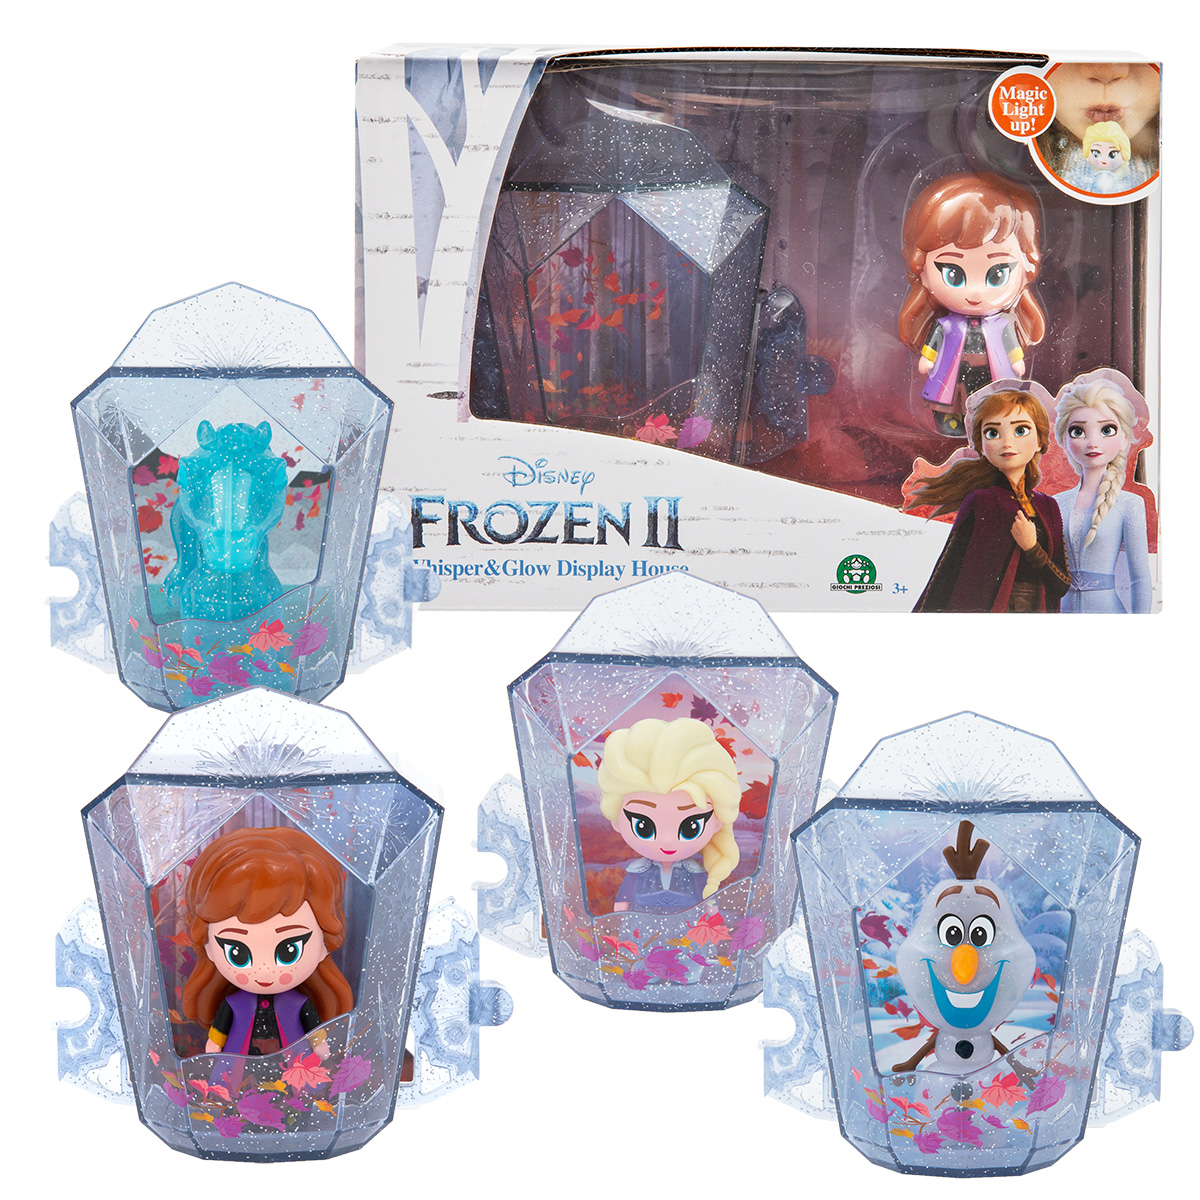 Casuta cu figurina Frozen 2 Whisper And Glow imagine hippoland.ro